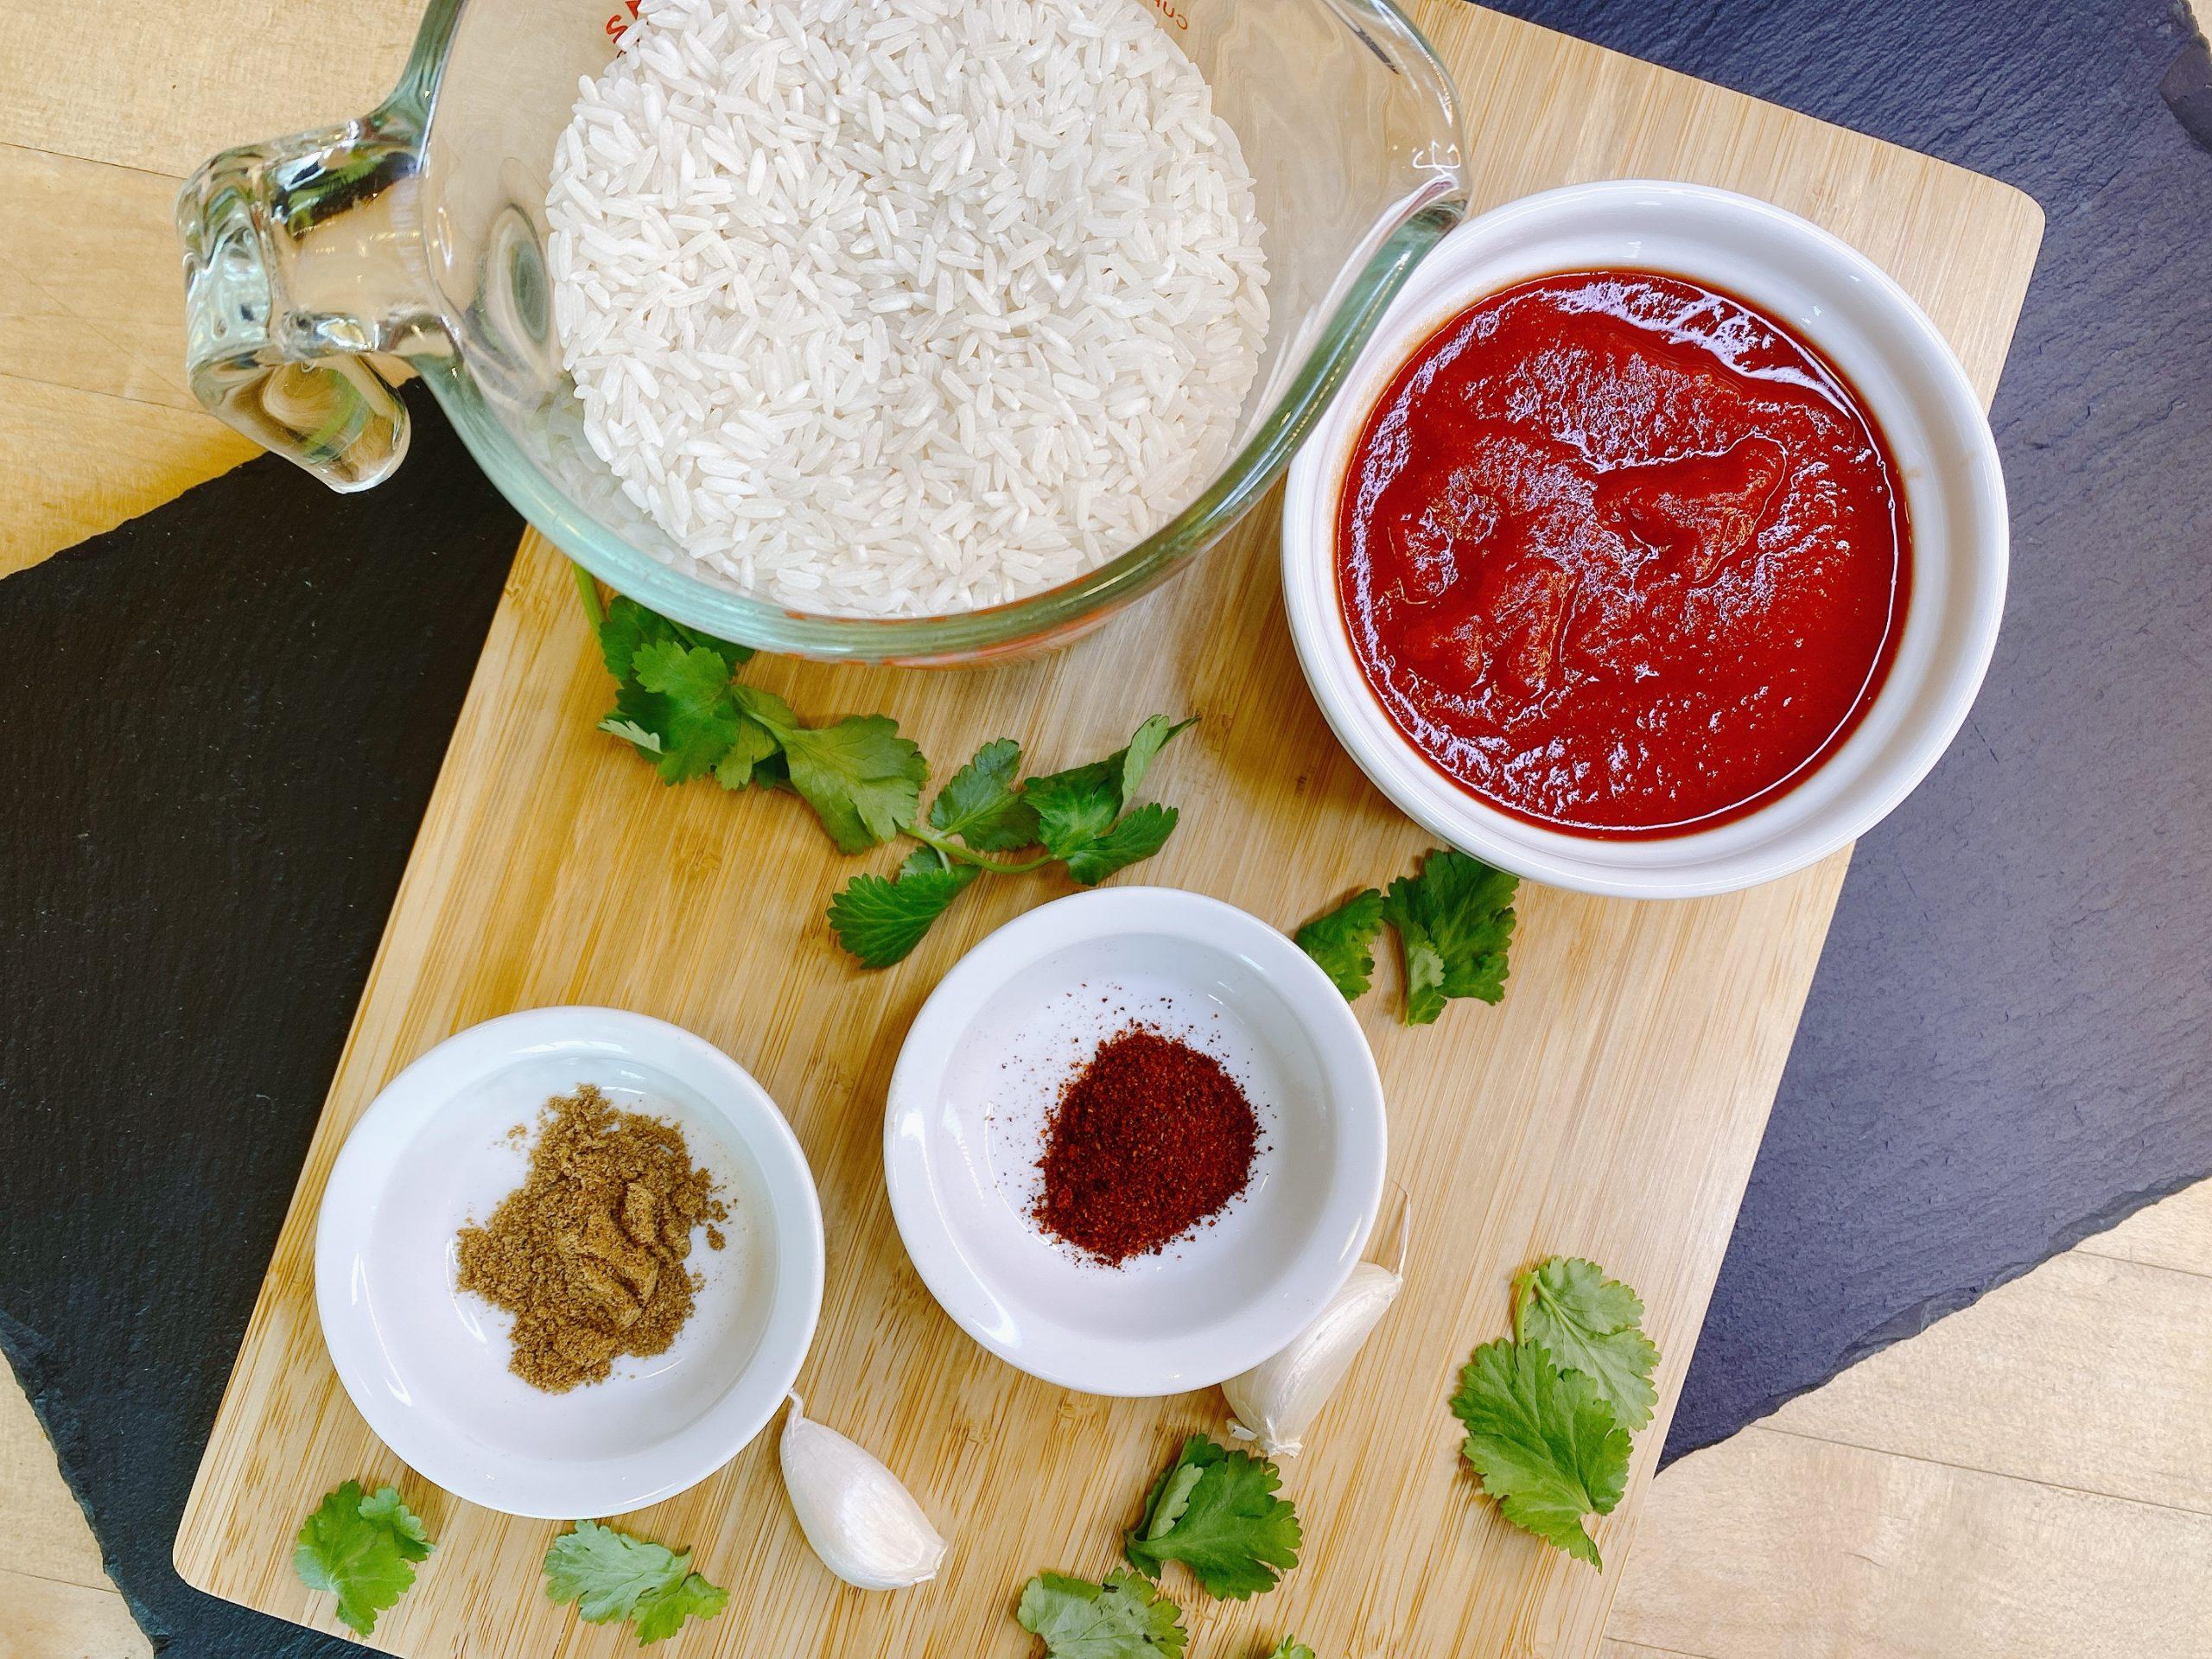 bowls of raw rice, tomato sauce, chili powder and cumin